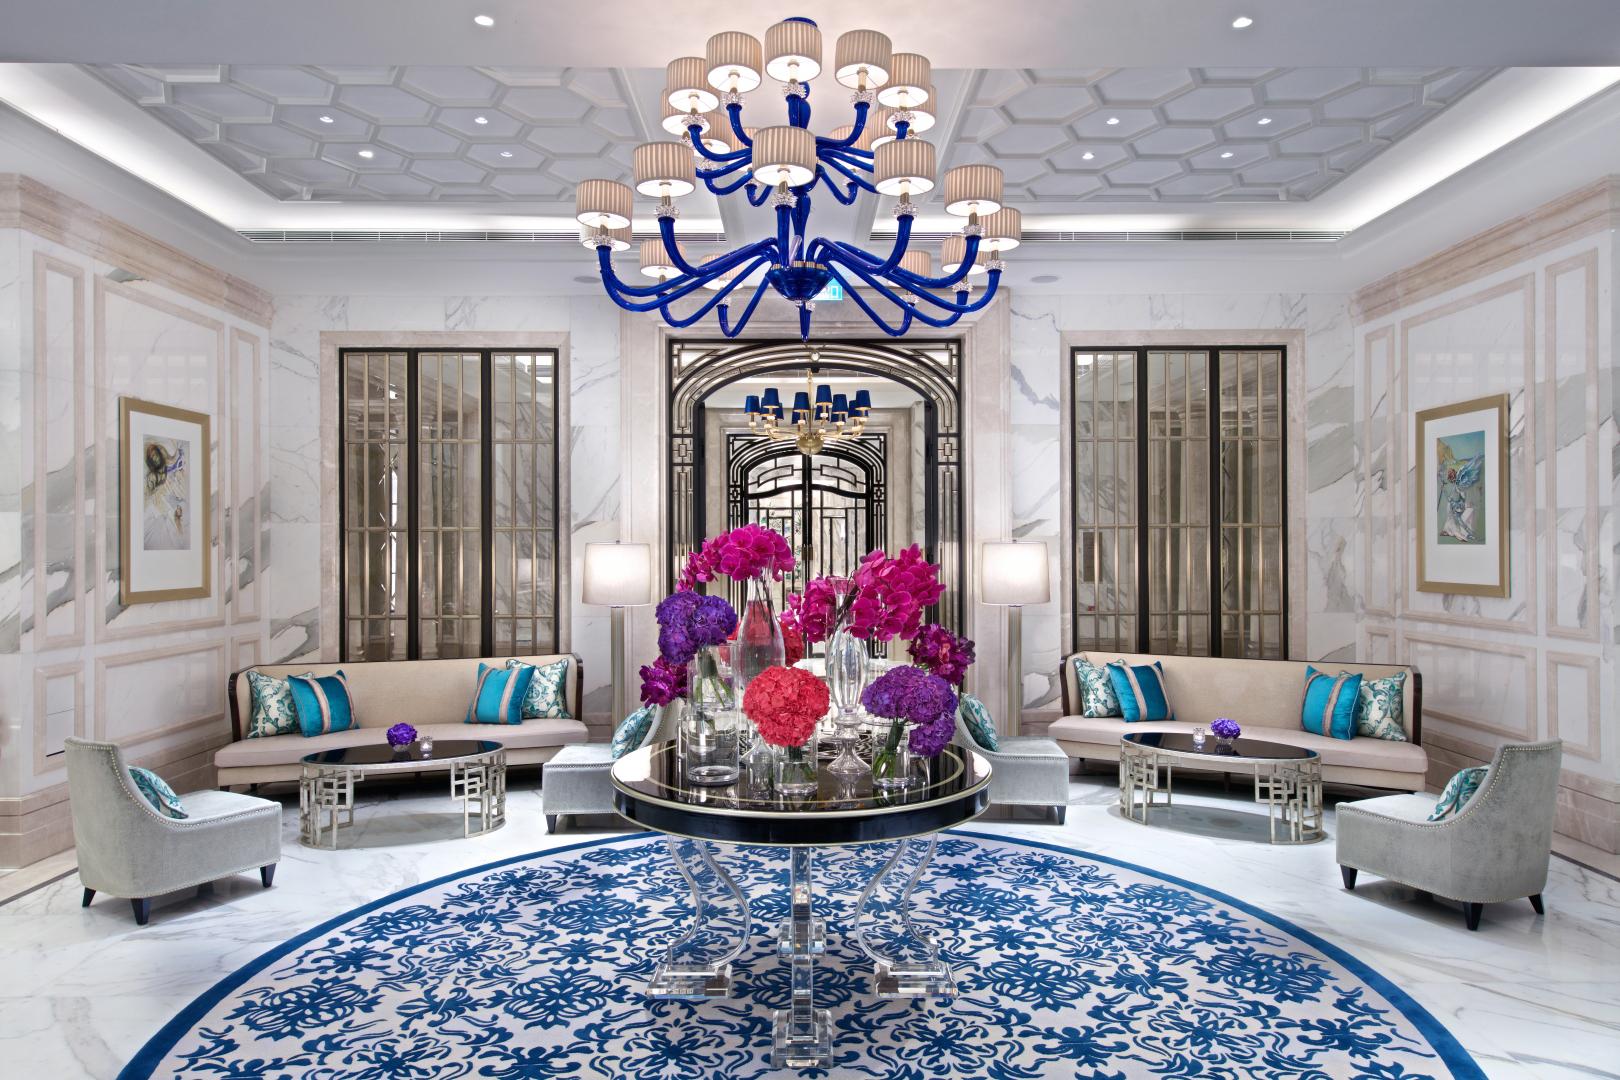 Top 20 hospitality giants 2016 - Interior arrangement and design association ...